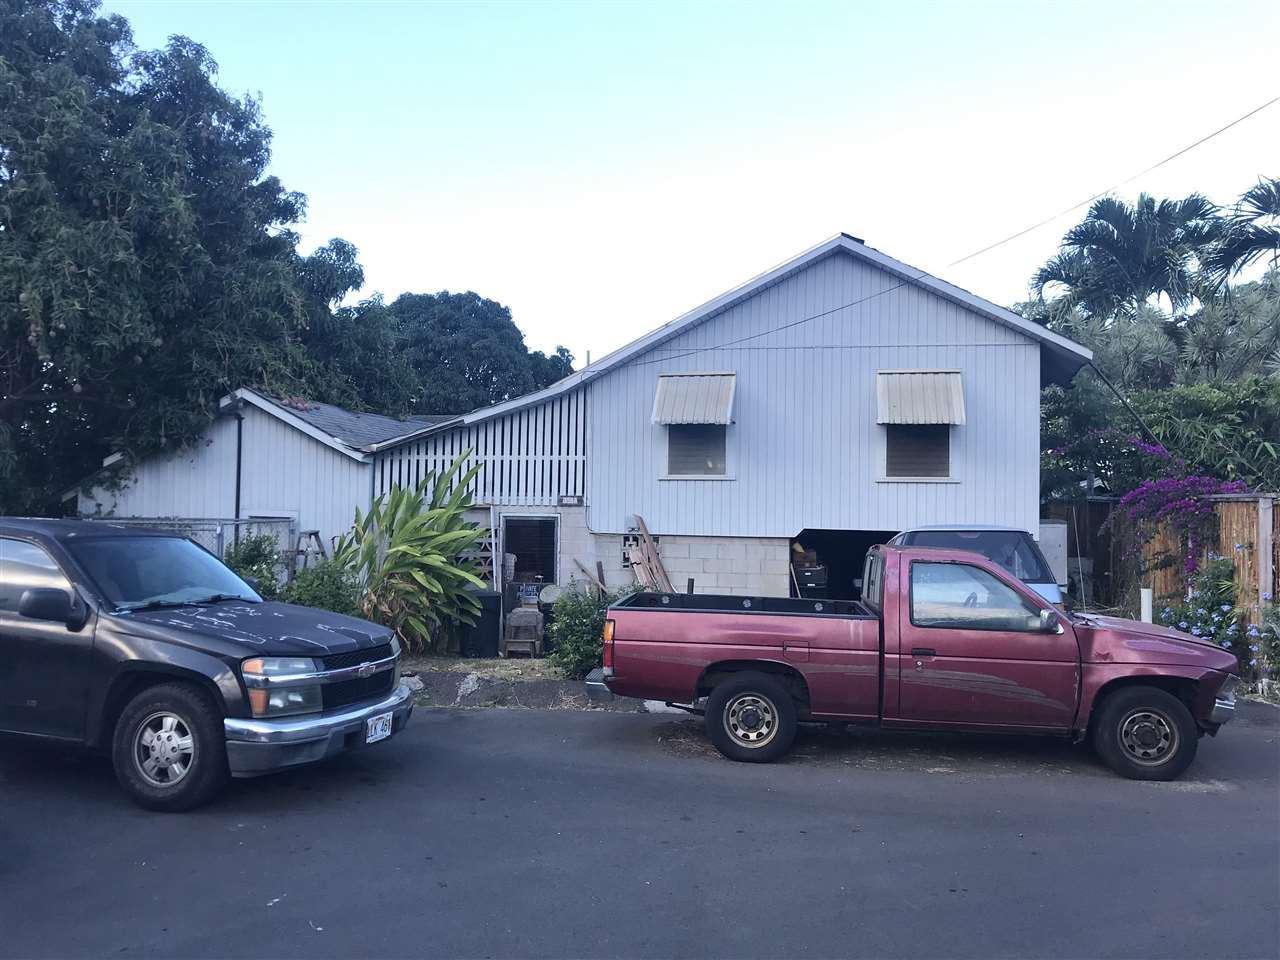 Photo of 351 Ea St, Wailuku, HI 96793-00 (MLS # 392391)